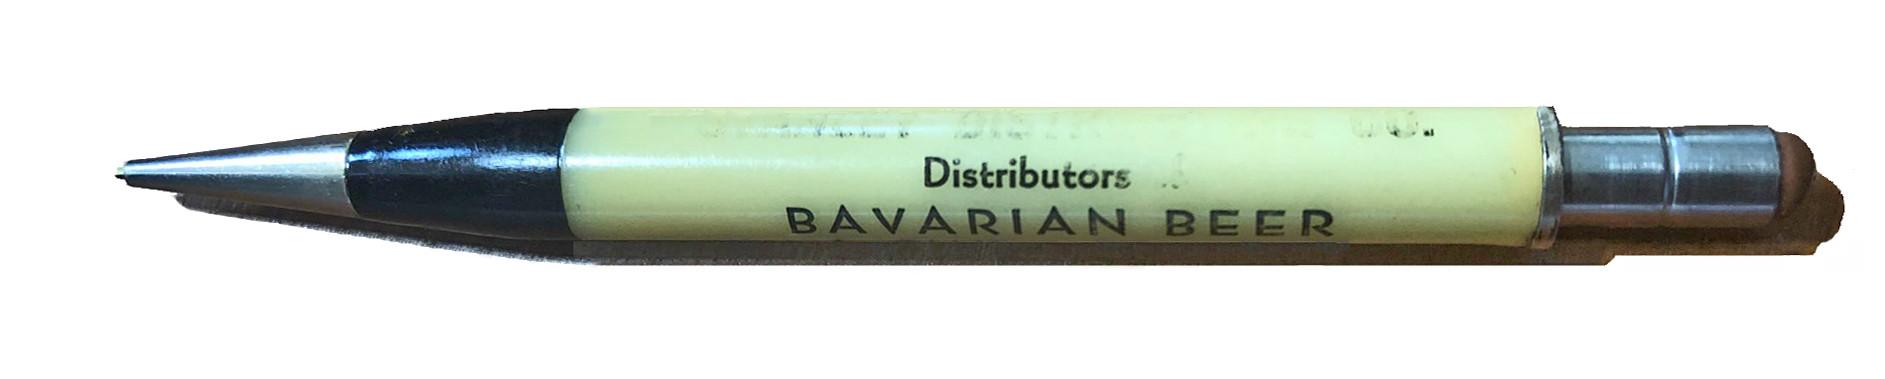 Bavarian Stanley Pencil1.jpg